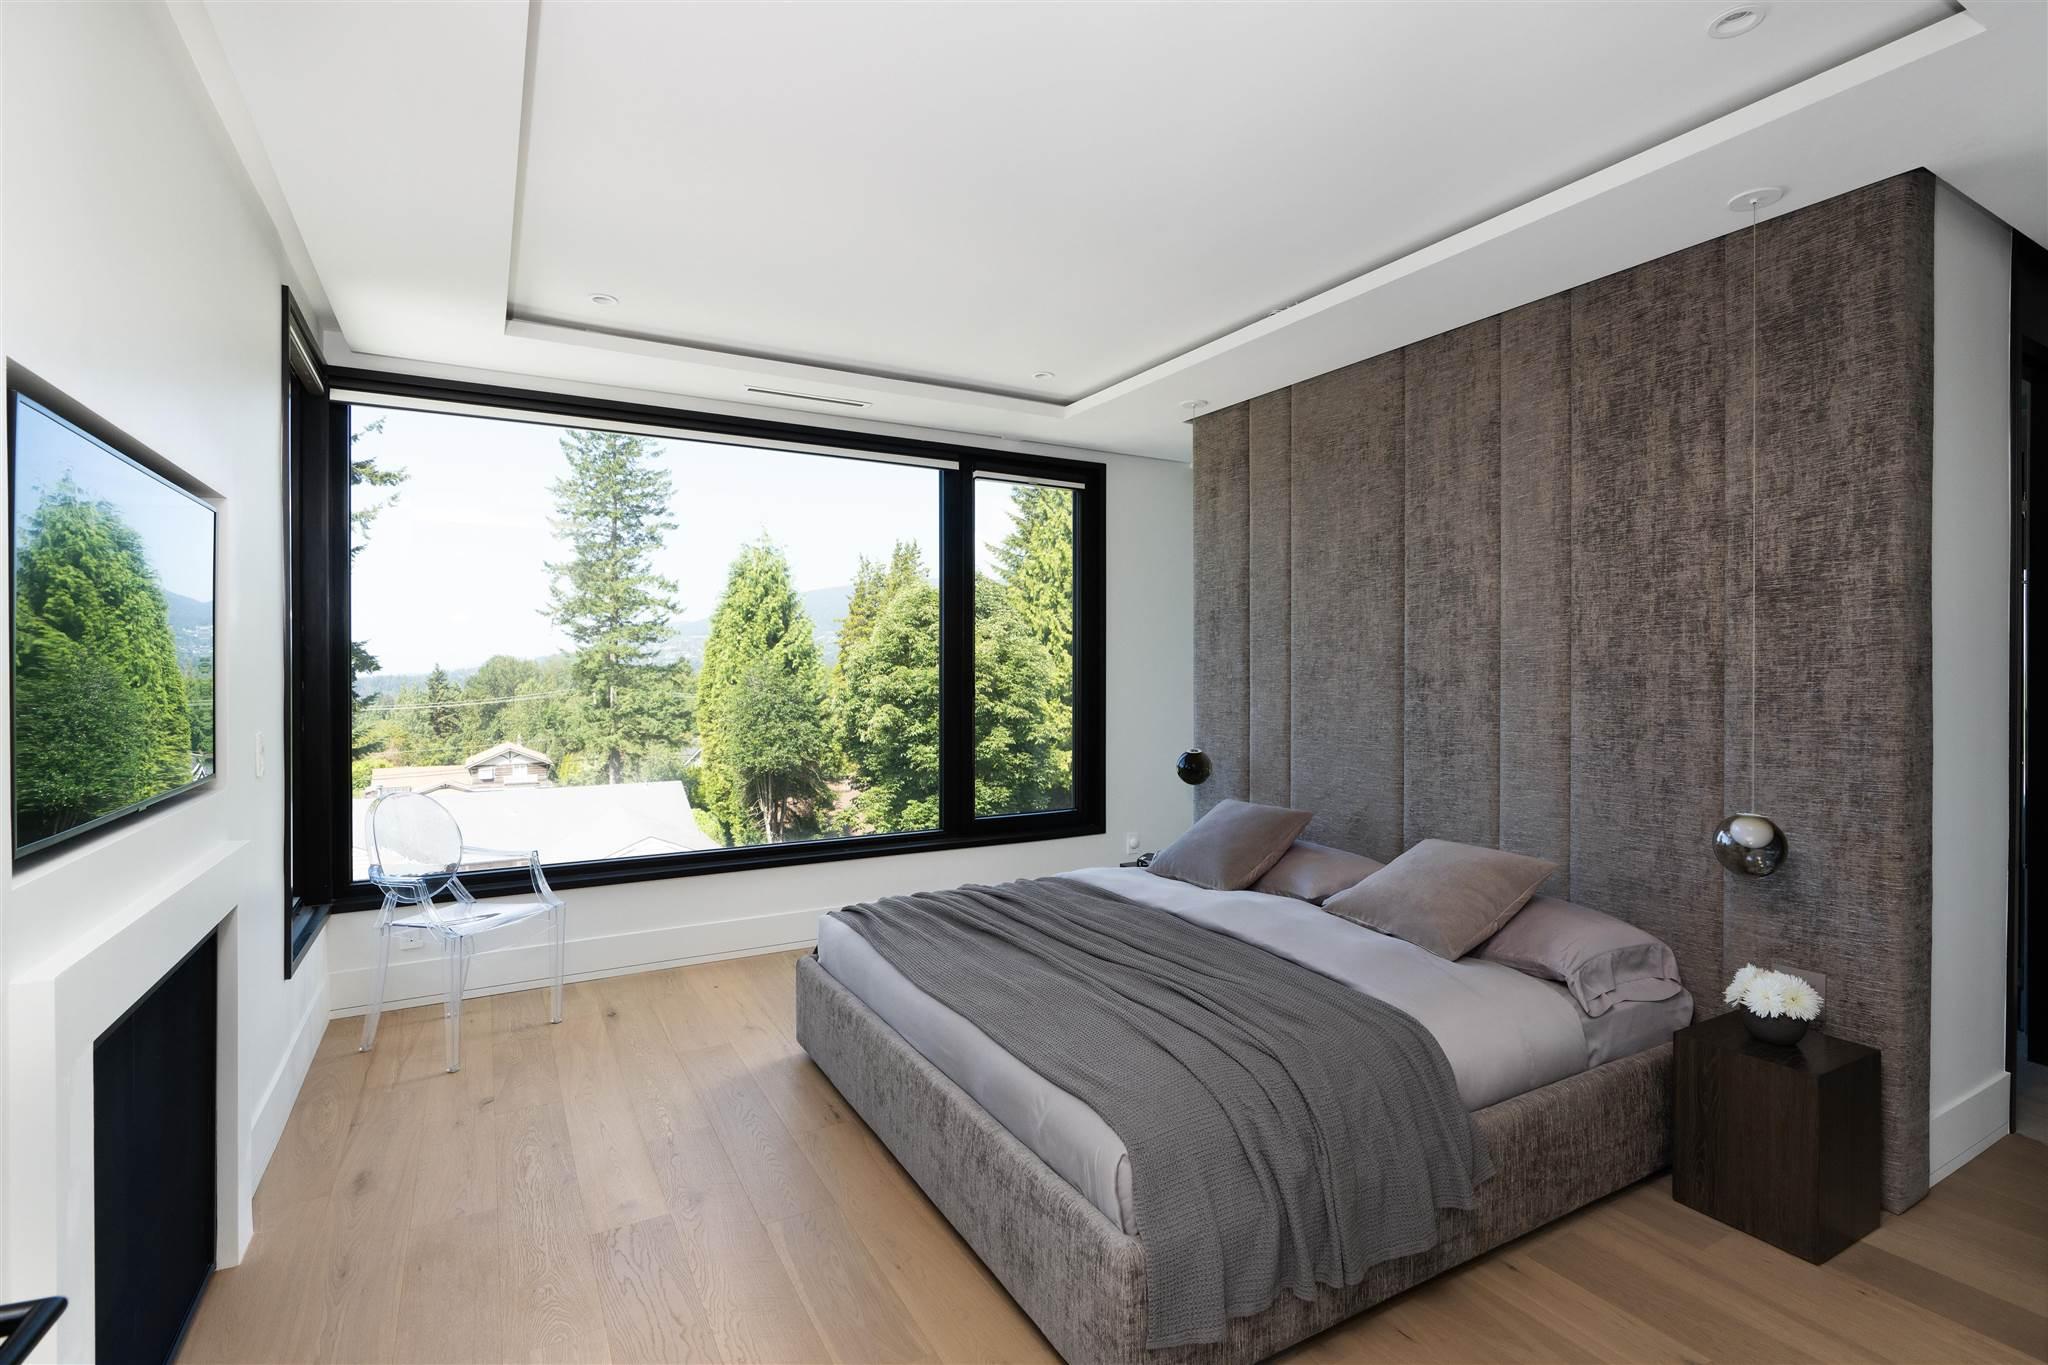 276 SANDRINGHAM CRESCENT - Upper Lonsdale House/Single Family for sale, 7 Bedrooms (R2617703) - #24